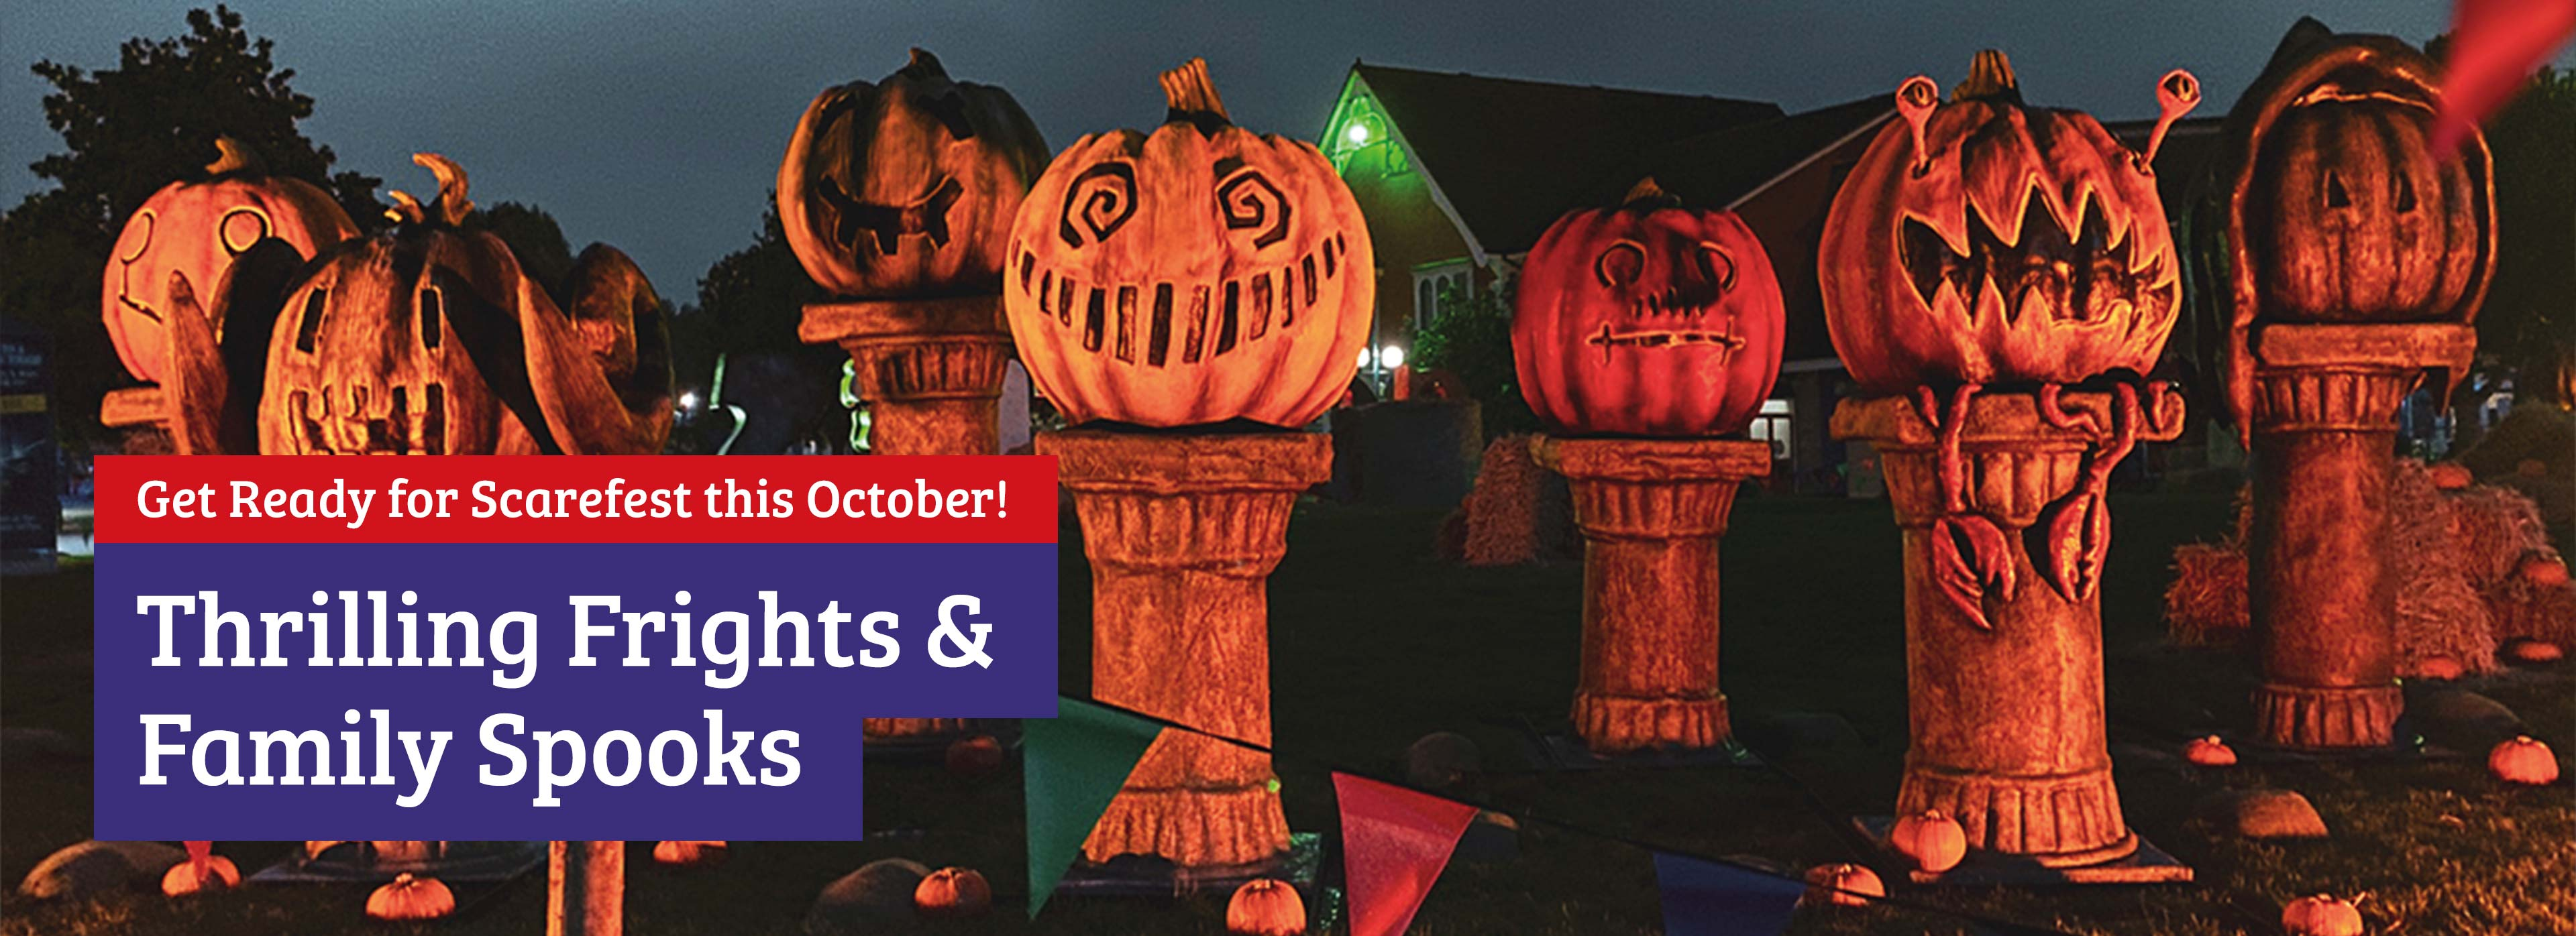 Scarefest Halloween short breaks at the Alton Towers Resort, including October half term